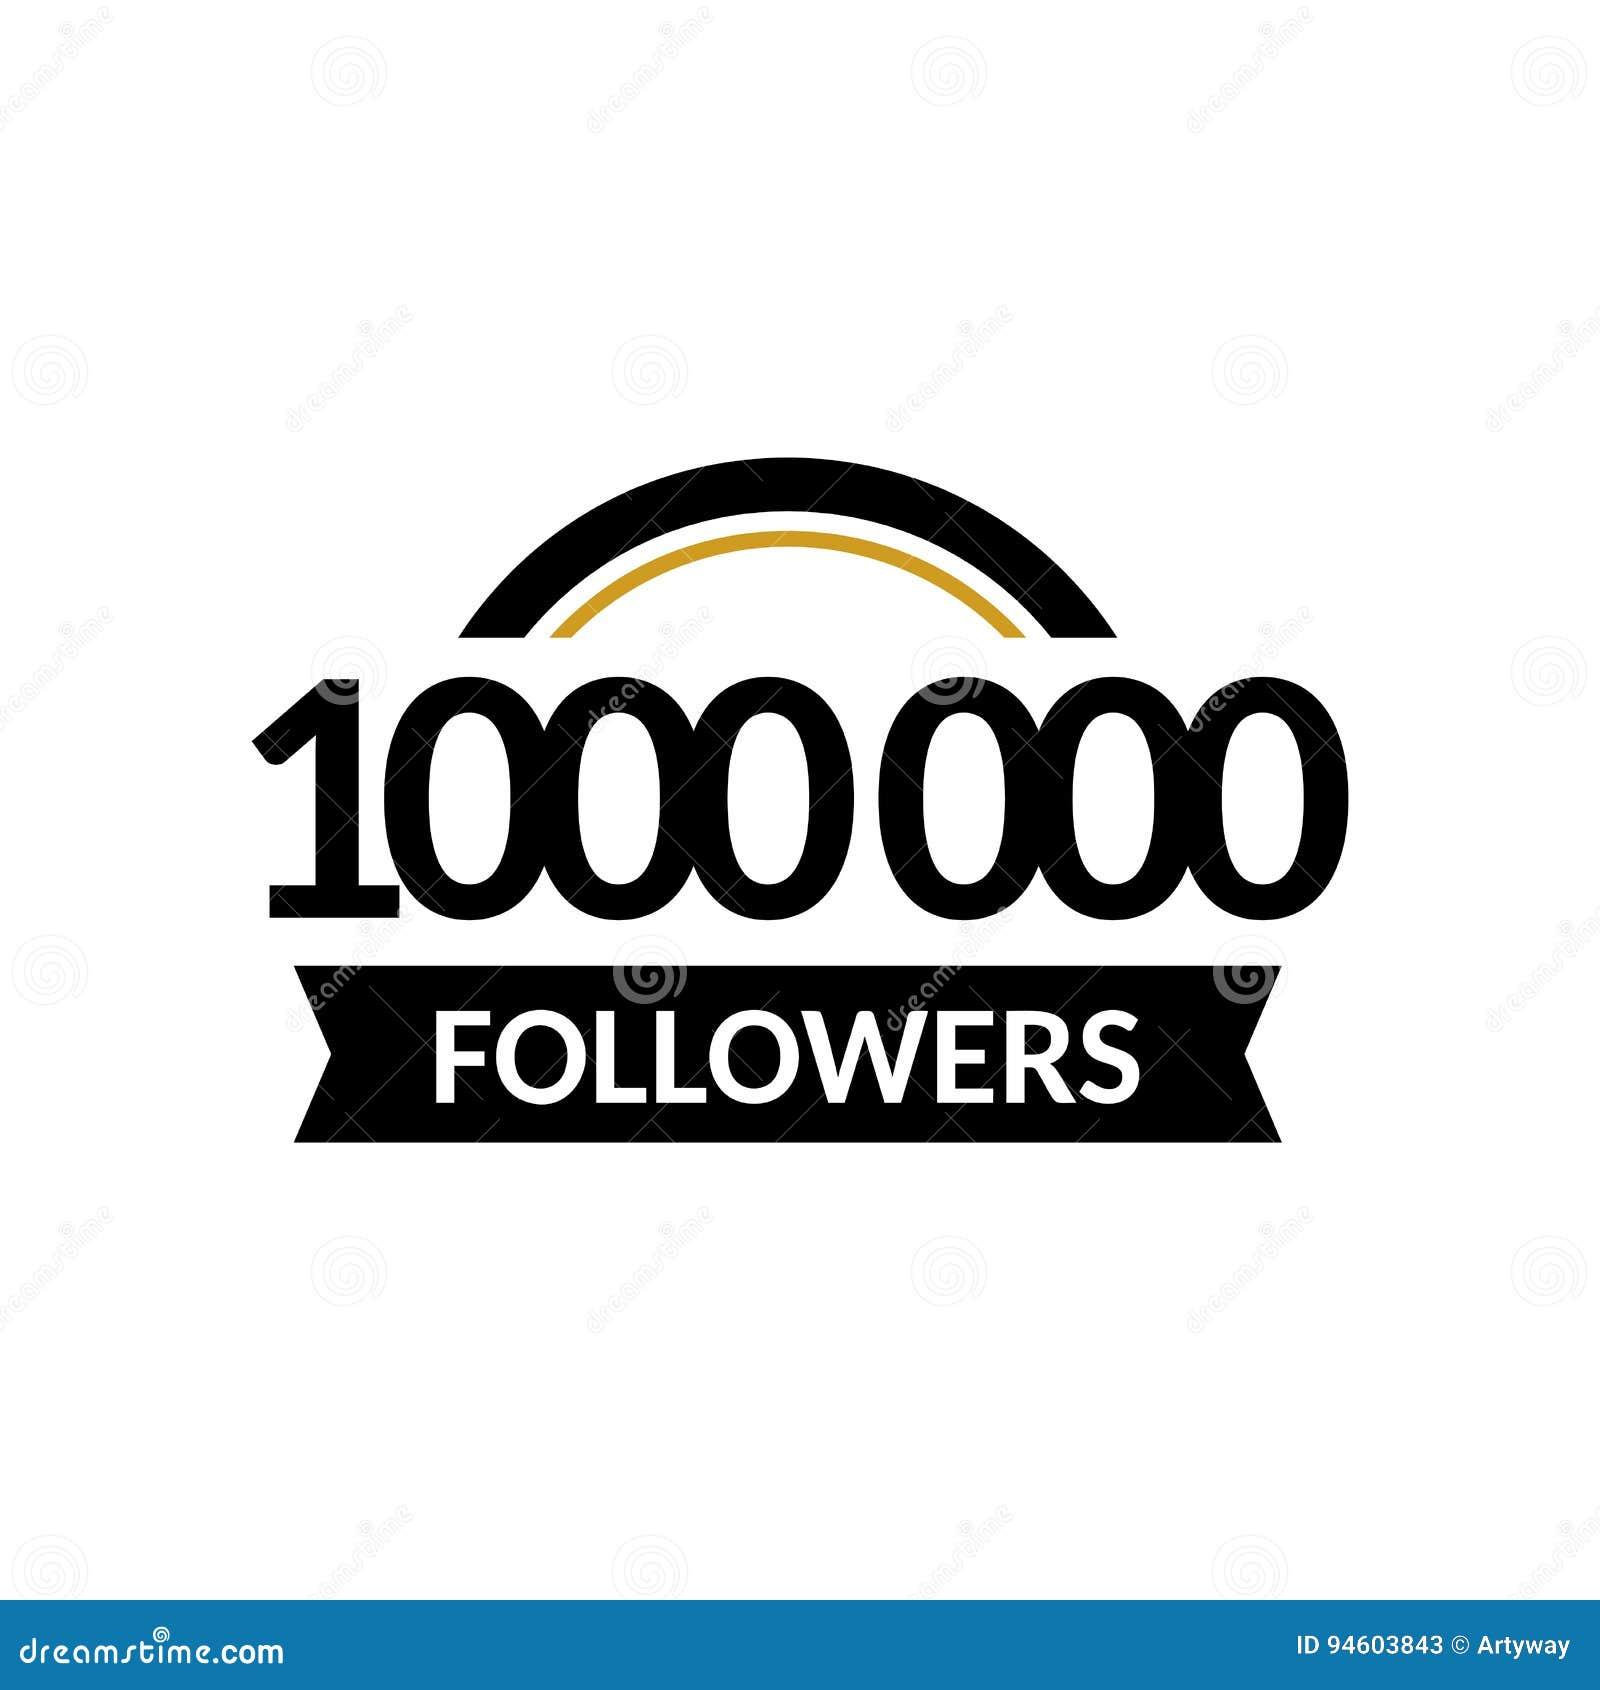 1000000 followers and friends 1m anniversary congratulations design